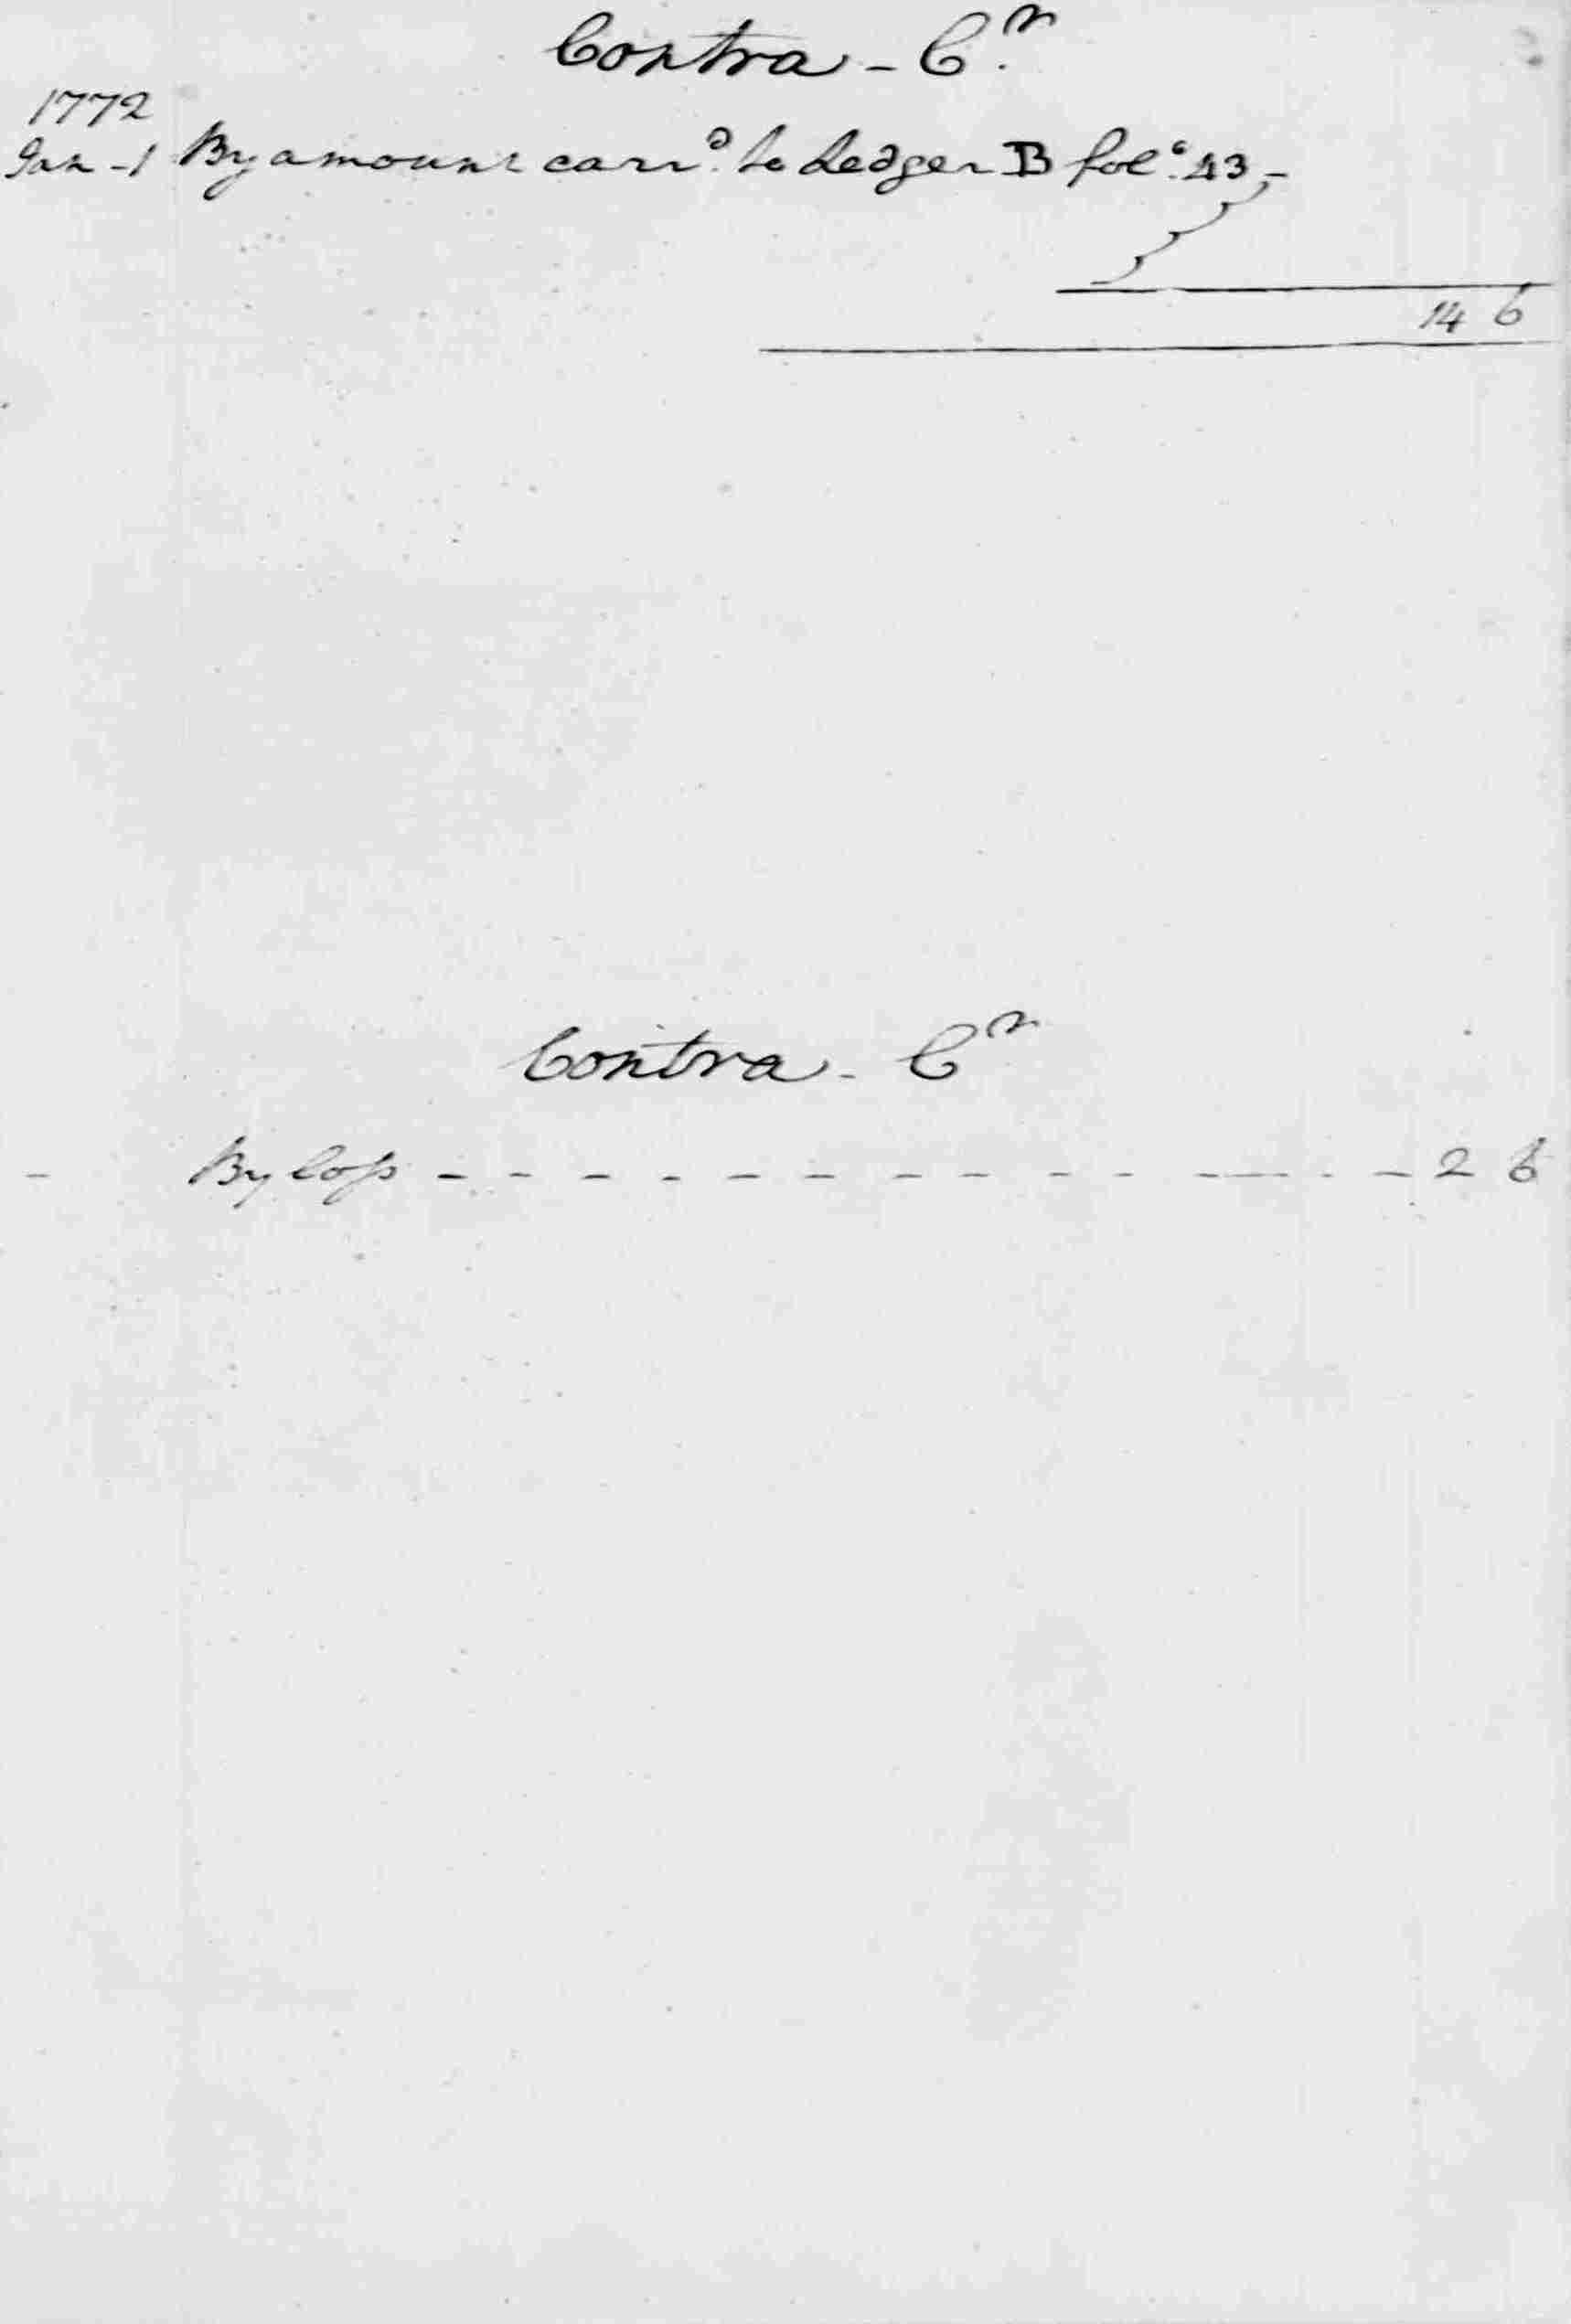 Ledger A, folio 353, right side